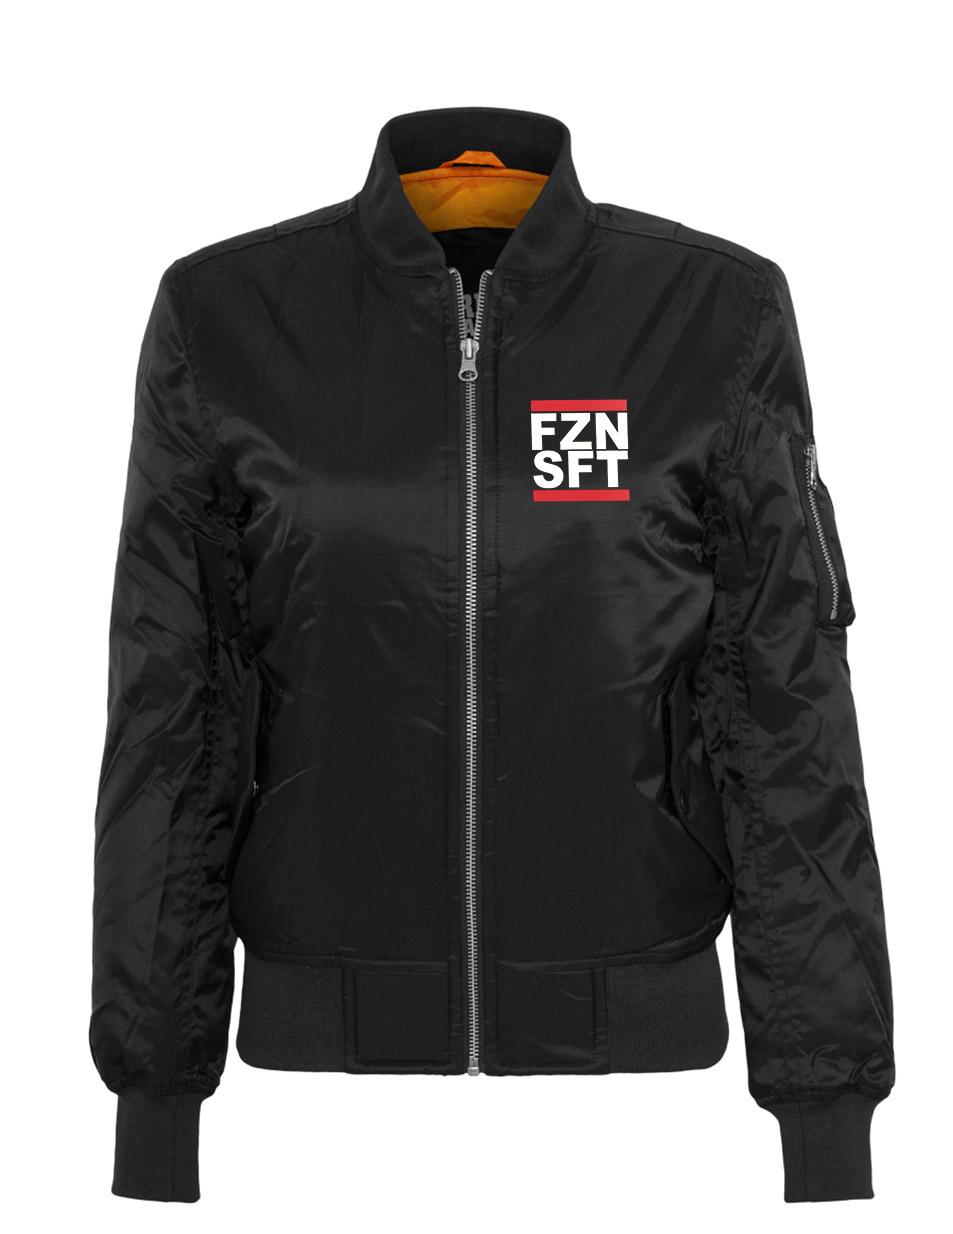 FZNSFT Ladies Bomber Jacket mehrfarbig auf schwarz